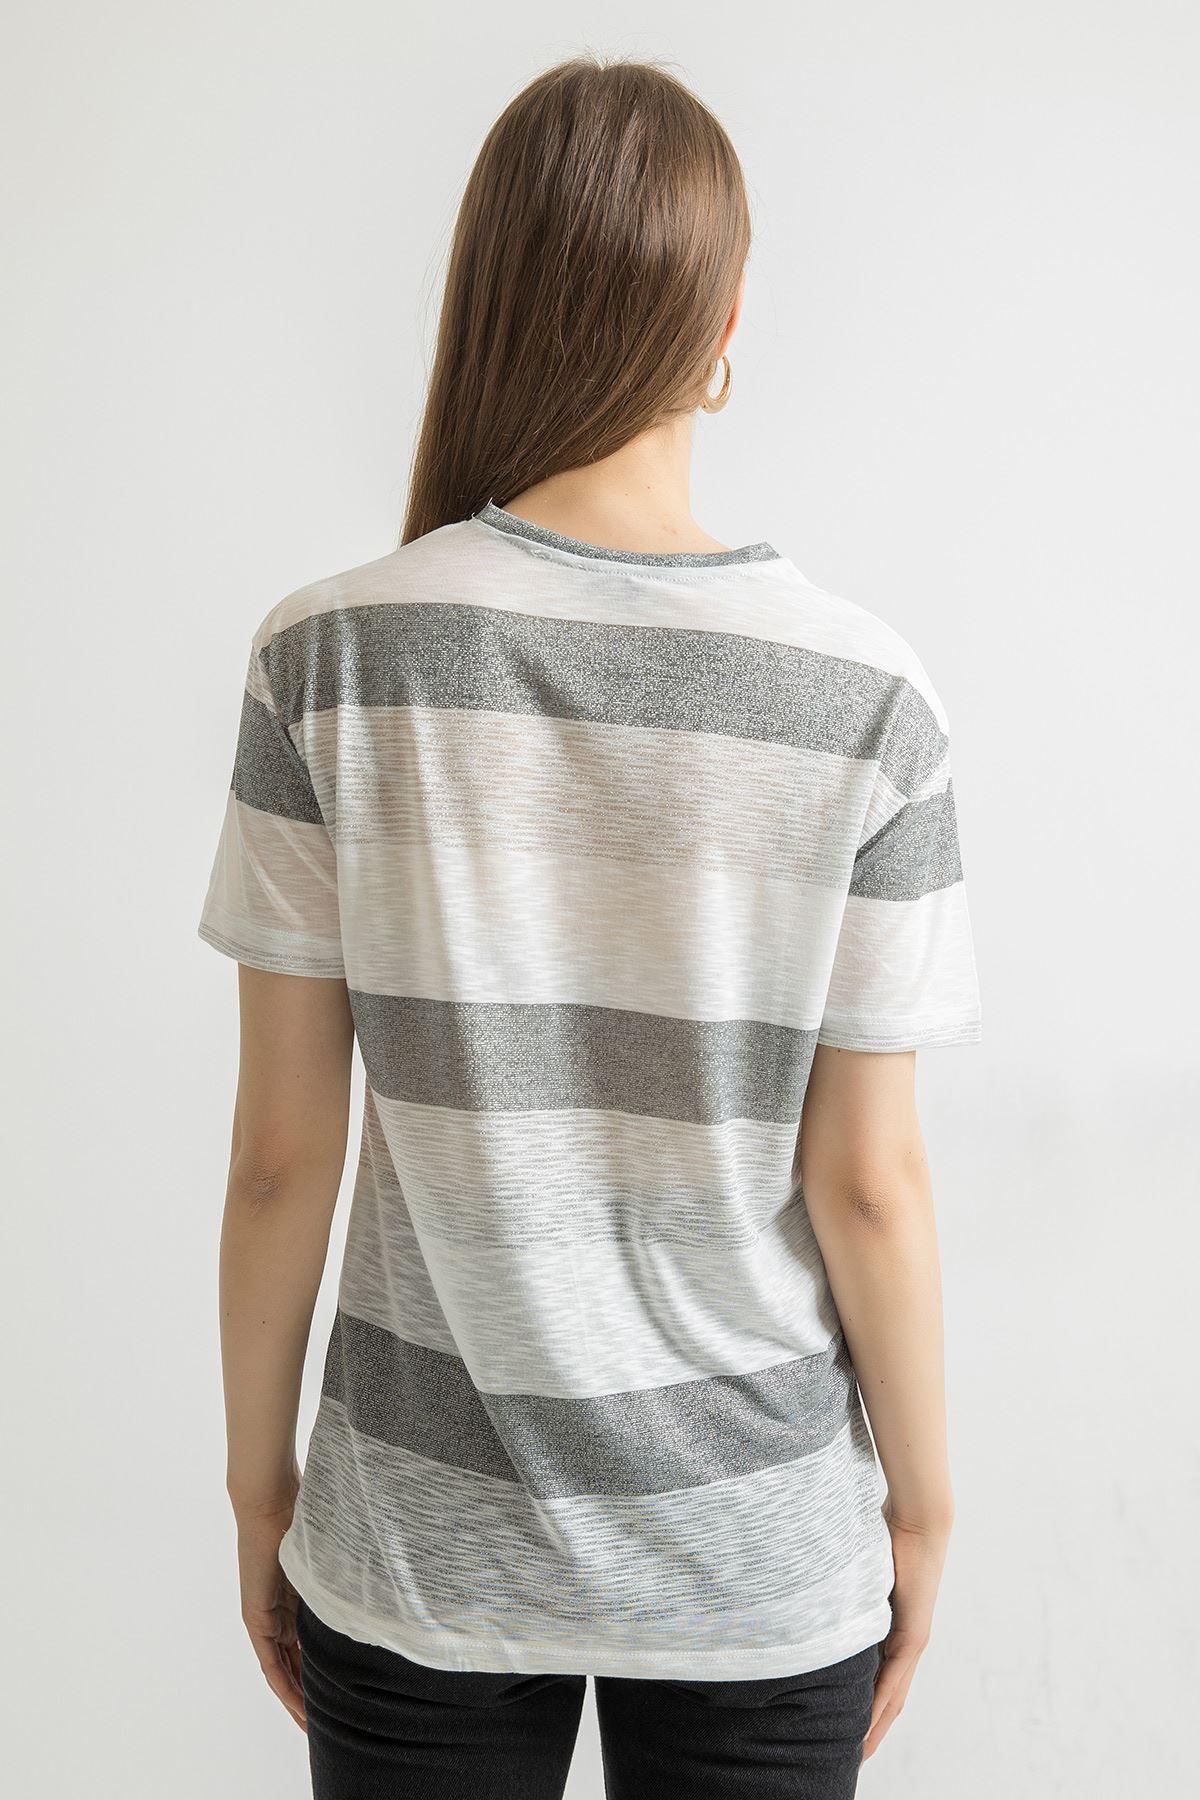 Stay Baskılıi T-shirt-Gri